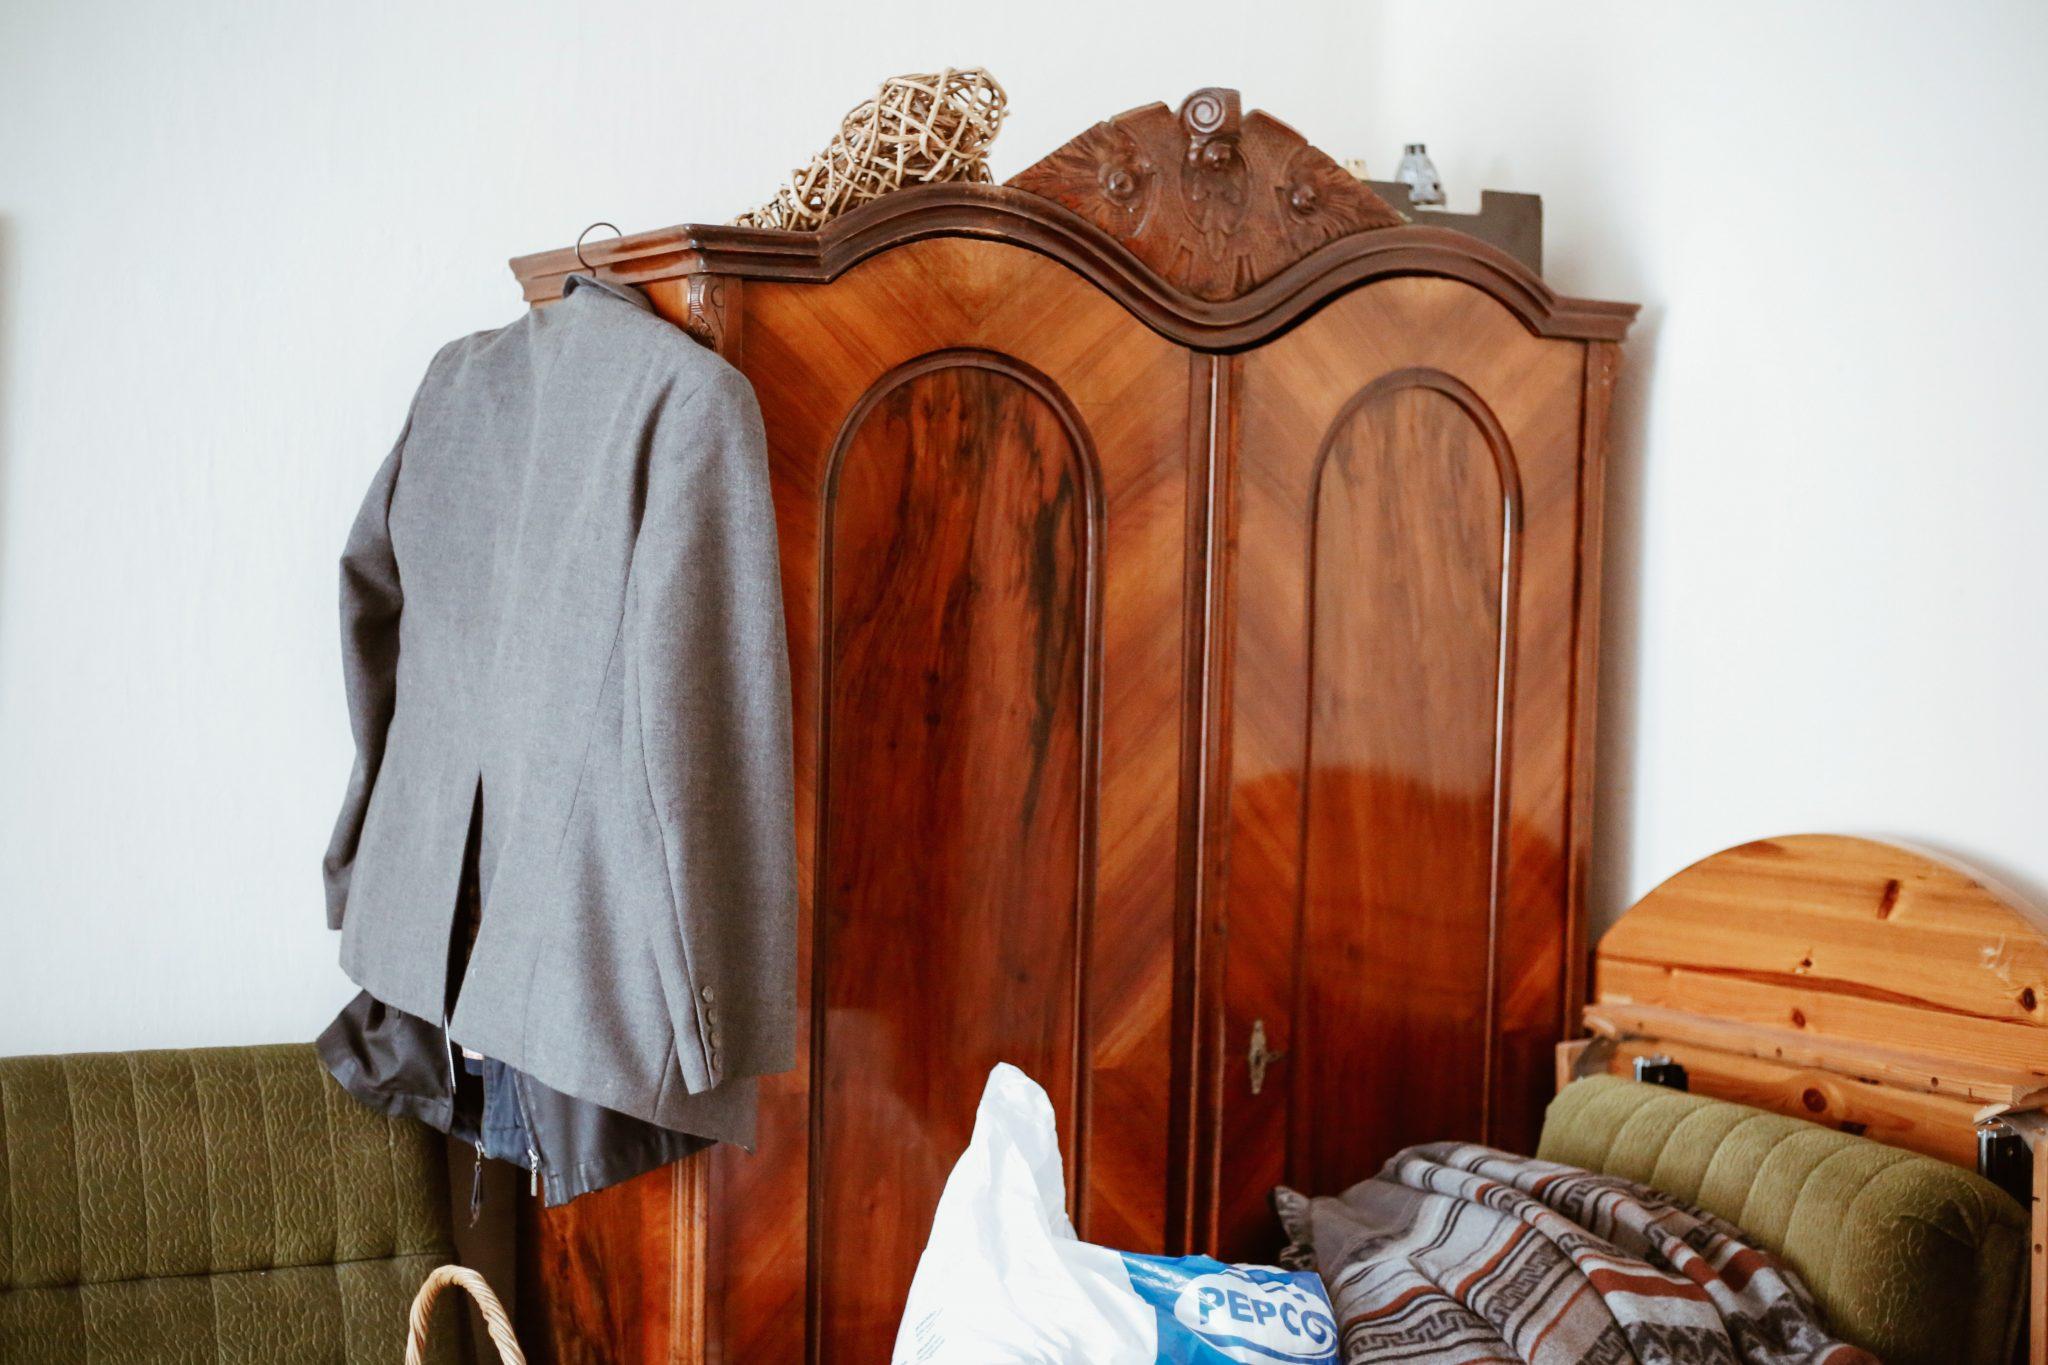 Mahagonischrank mit Anzug